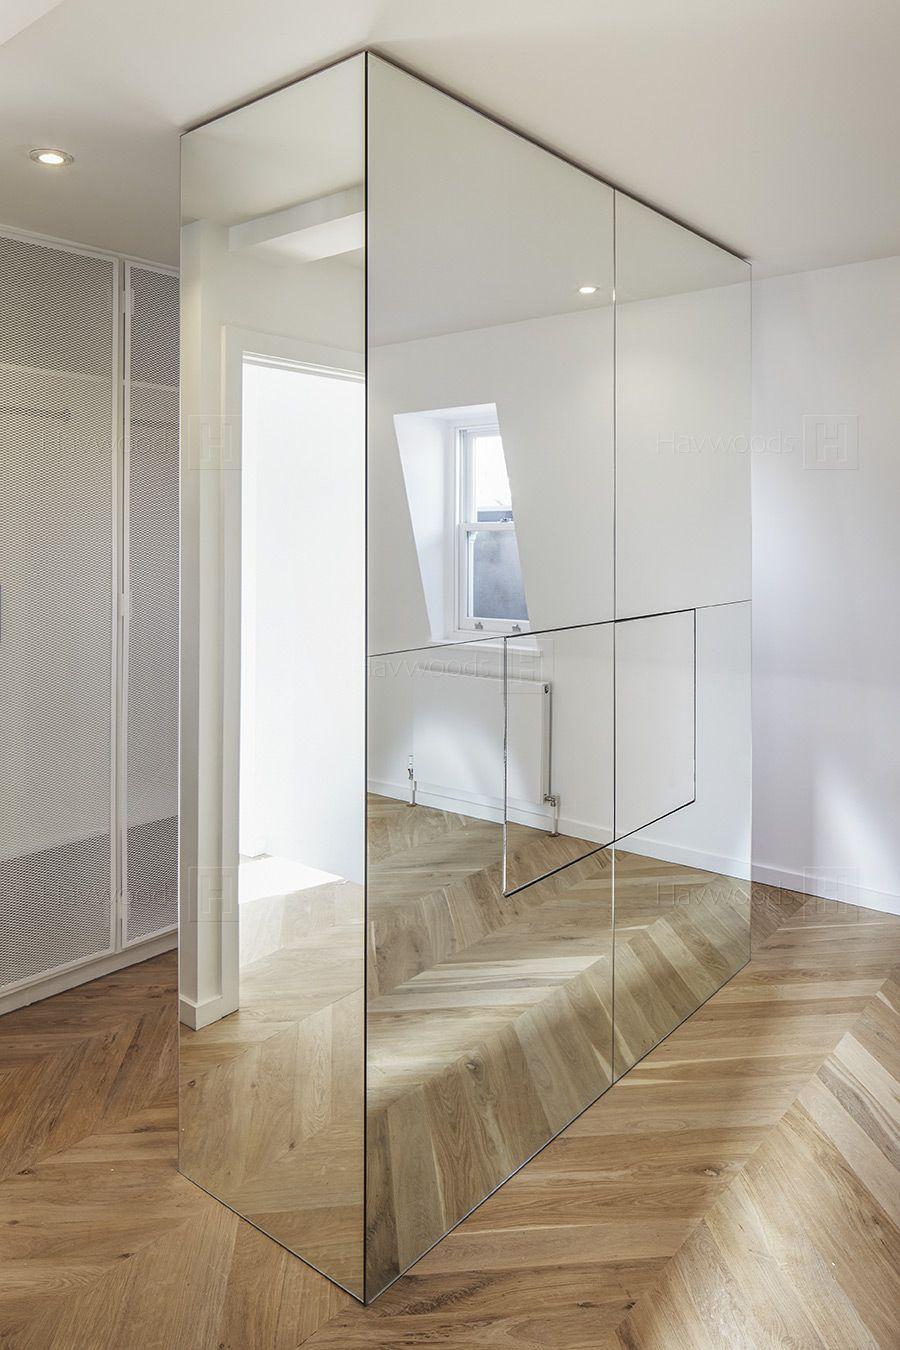 Skipstop House, Residential Havwoods Freestanding room